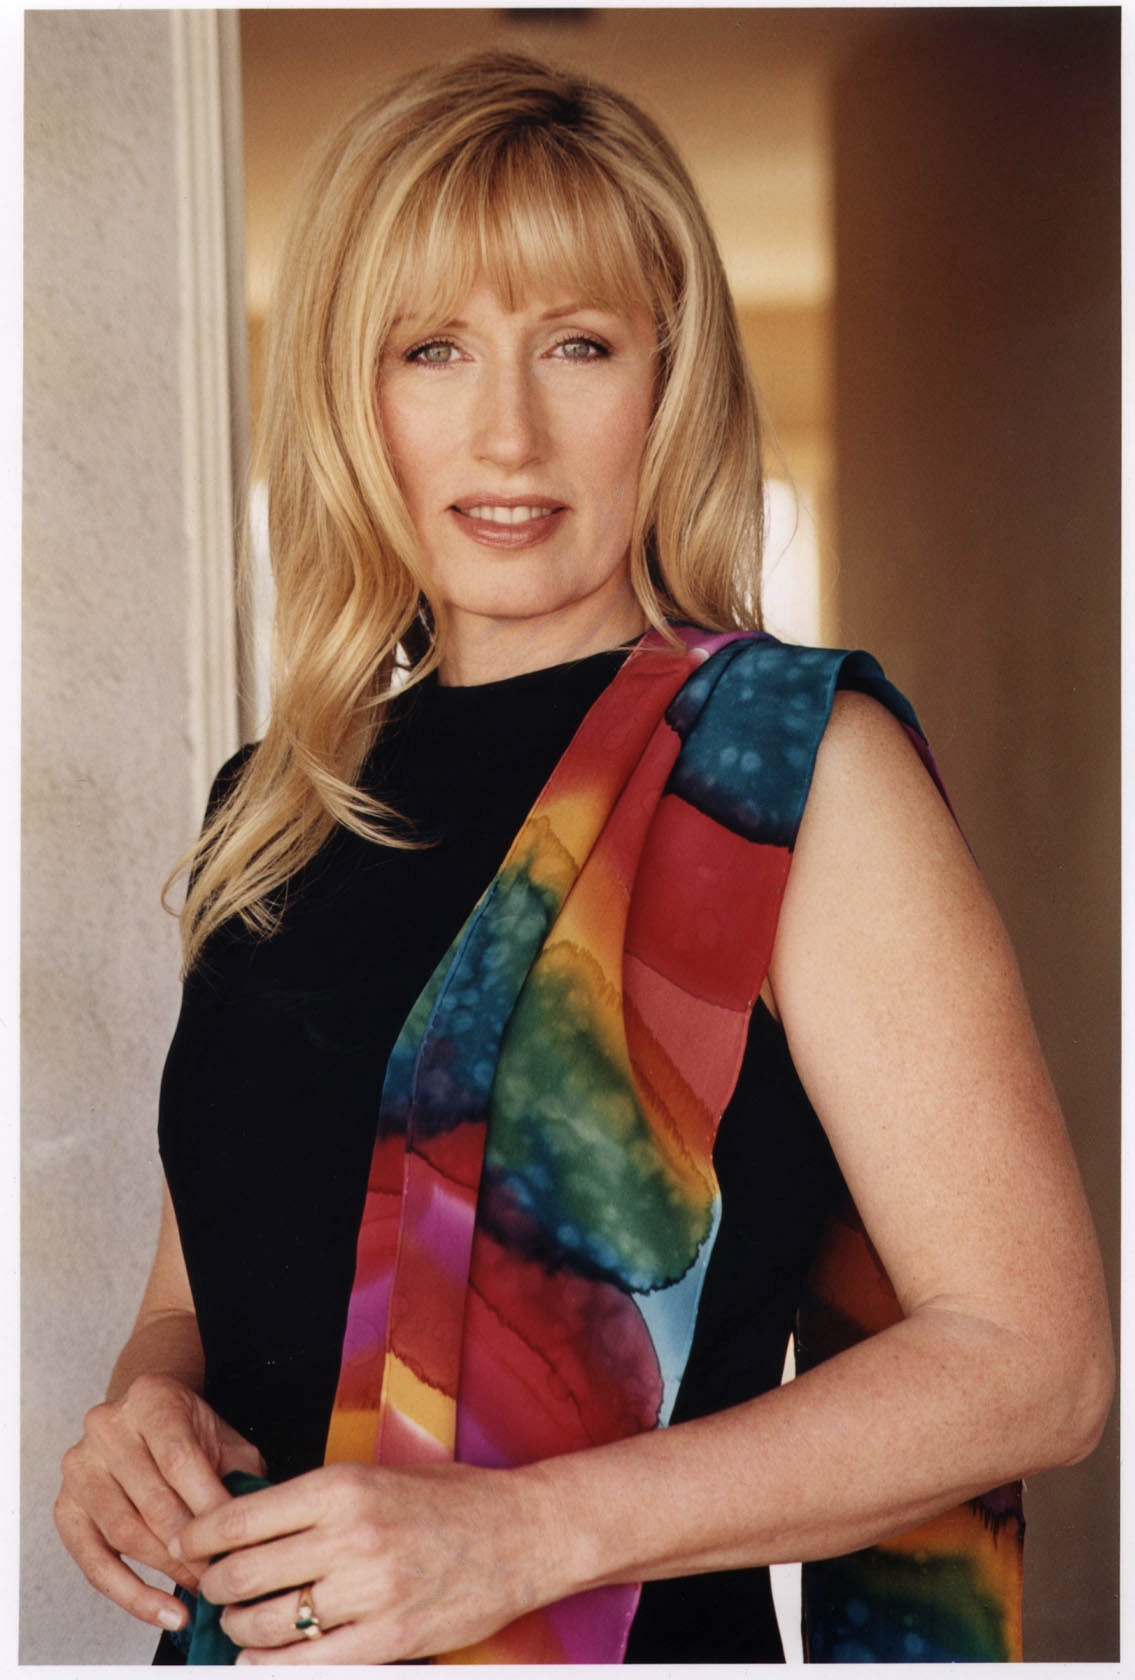 Darlene Koldenhoven - Bio, Facts, Family   Famous Birthdays  Darlene Koldenhoven